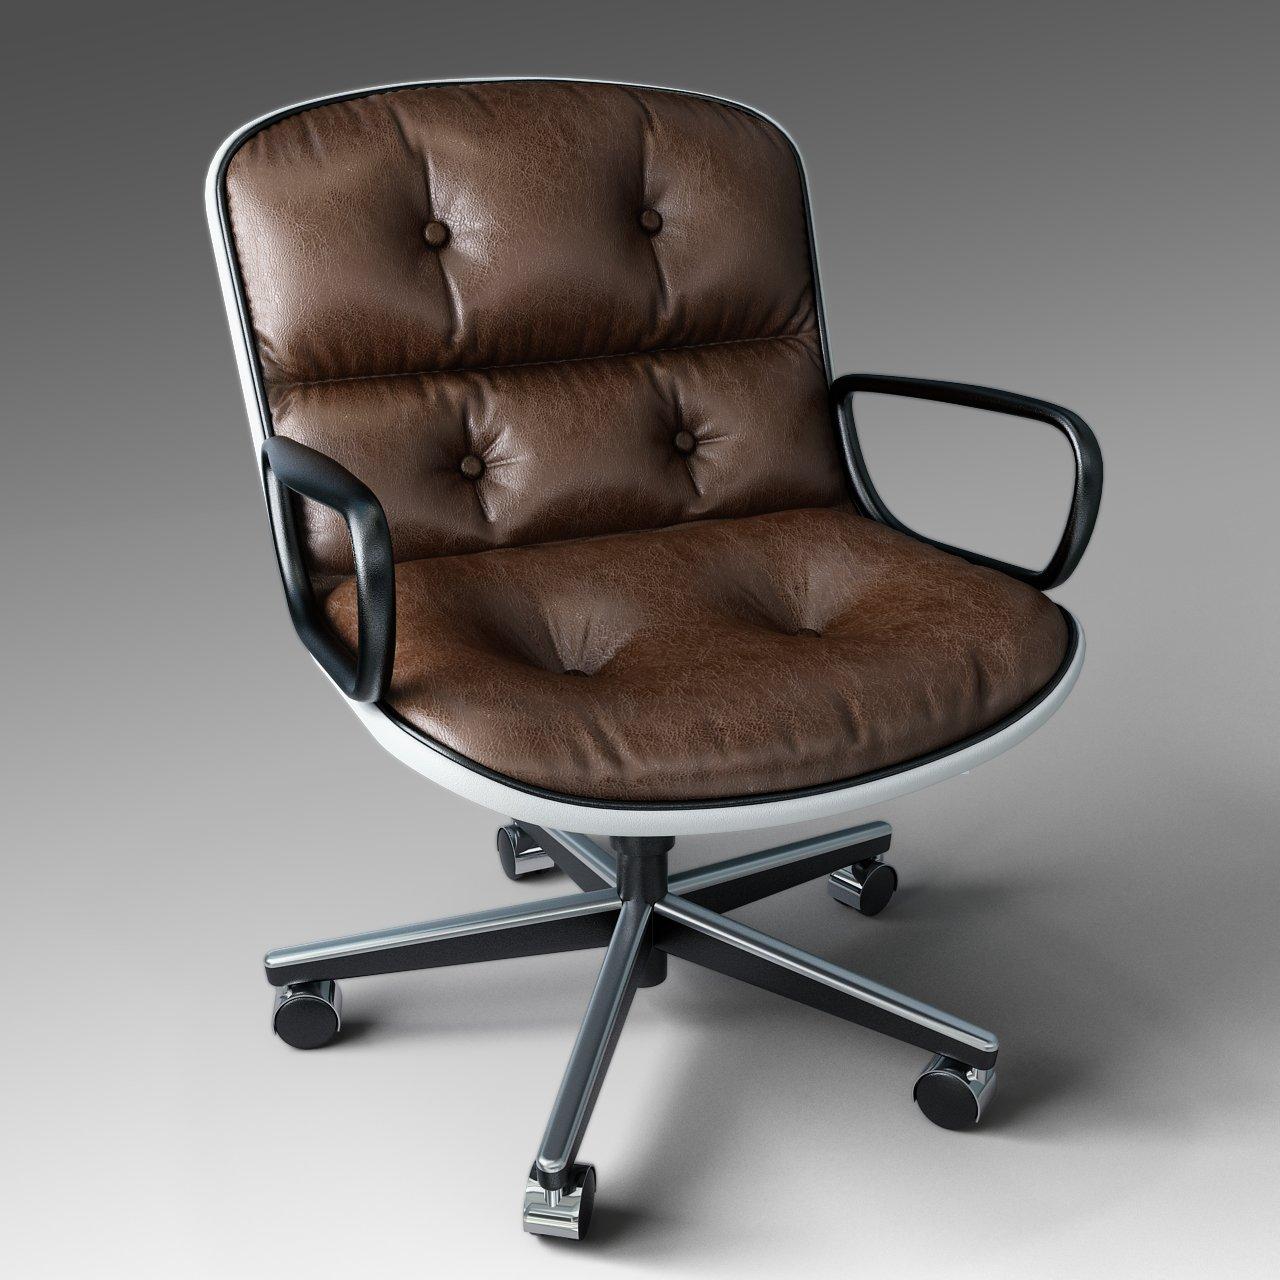 Merveilleux Pollock Executive Chair 3D Model